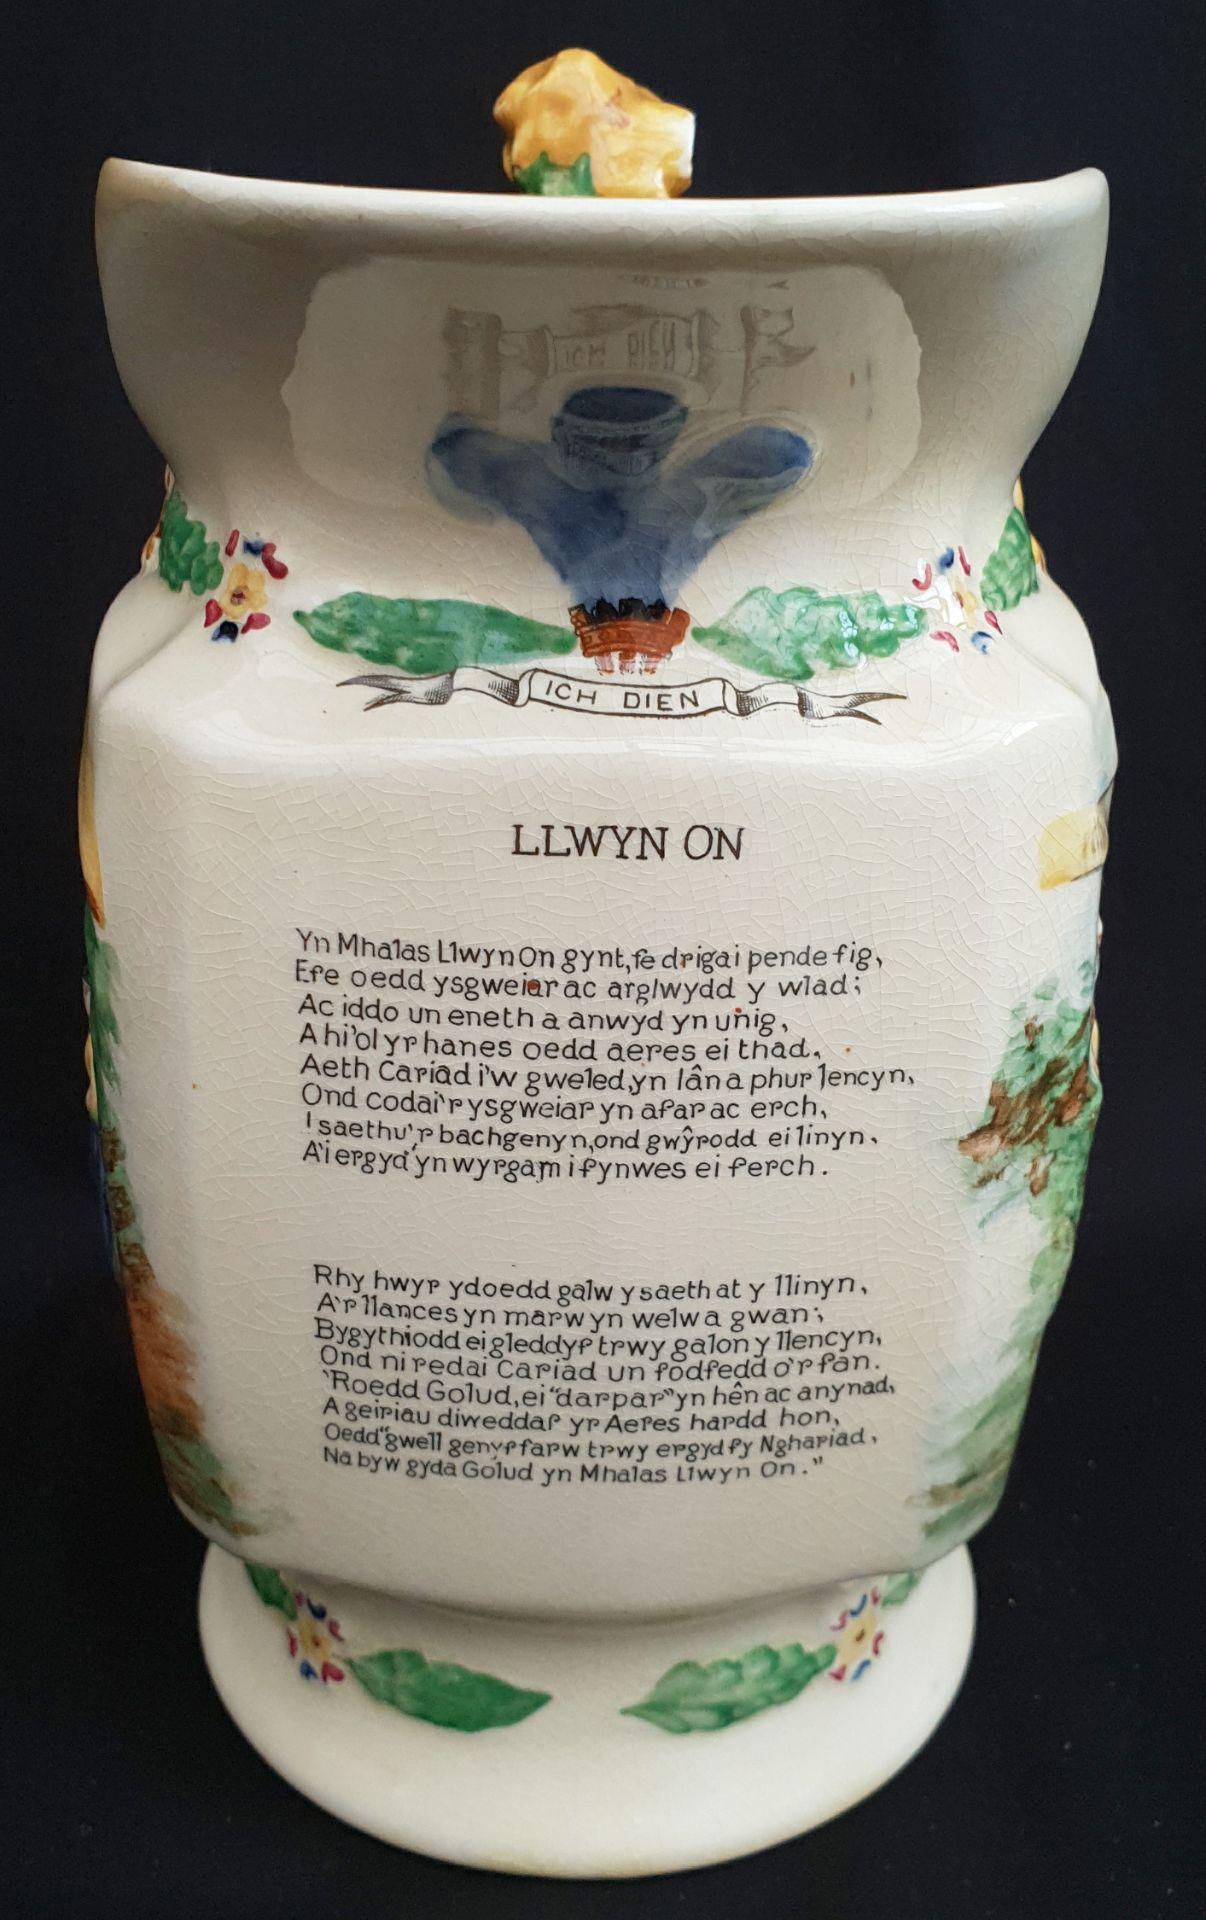 Antique Crown Devon Fielding Welsh Musical Water Jug Llewyn On - Image 2 of 4